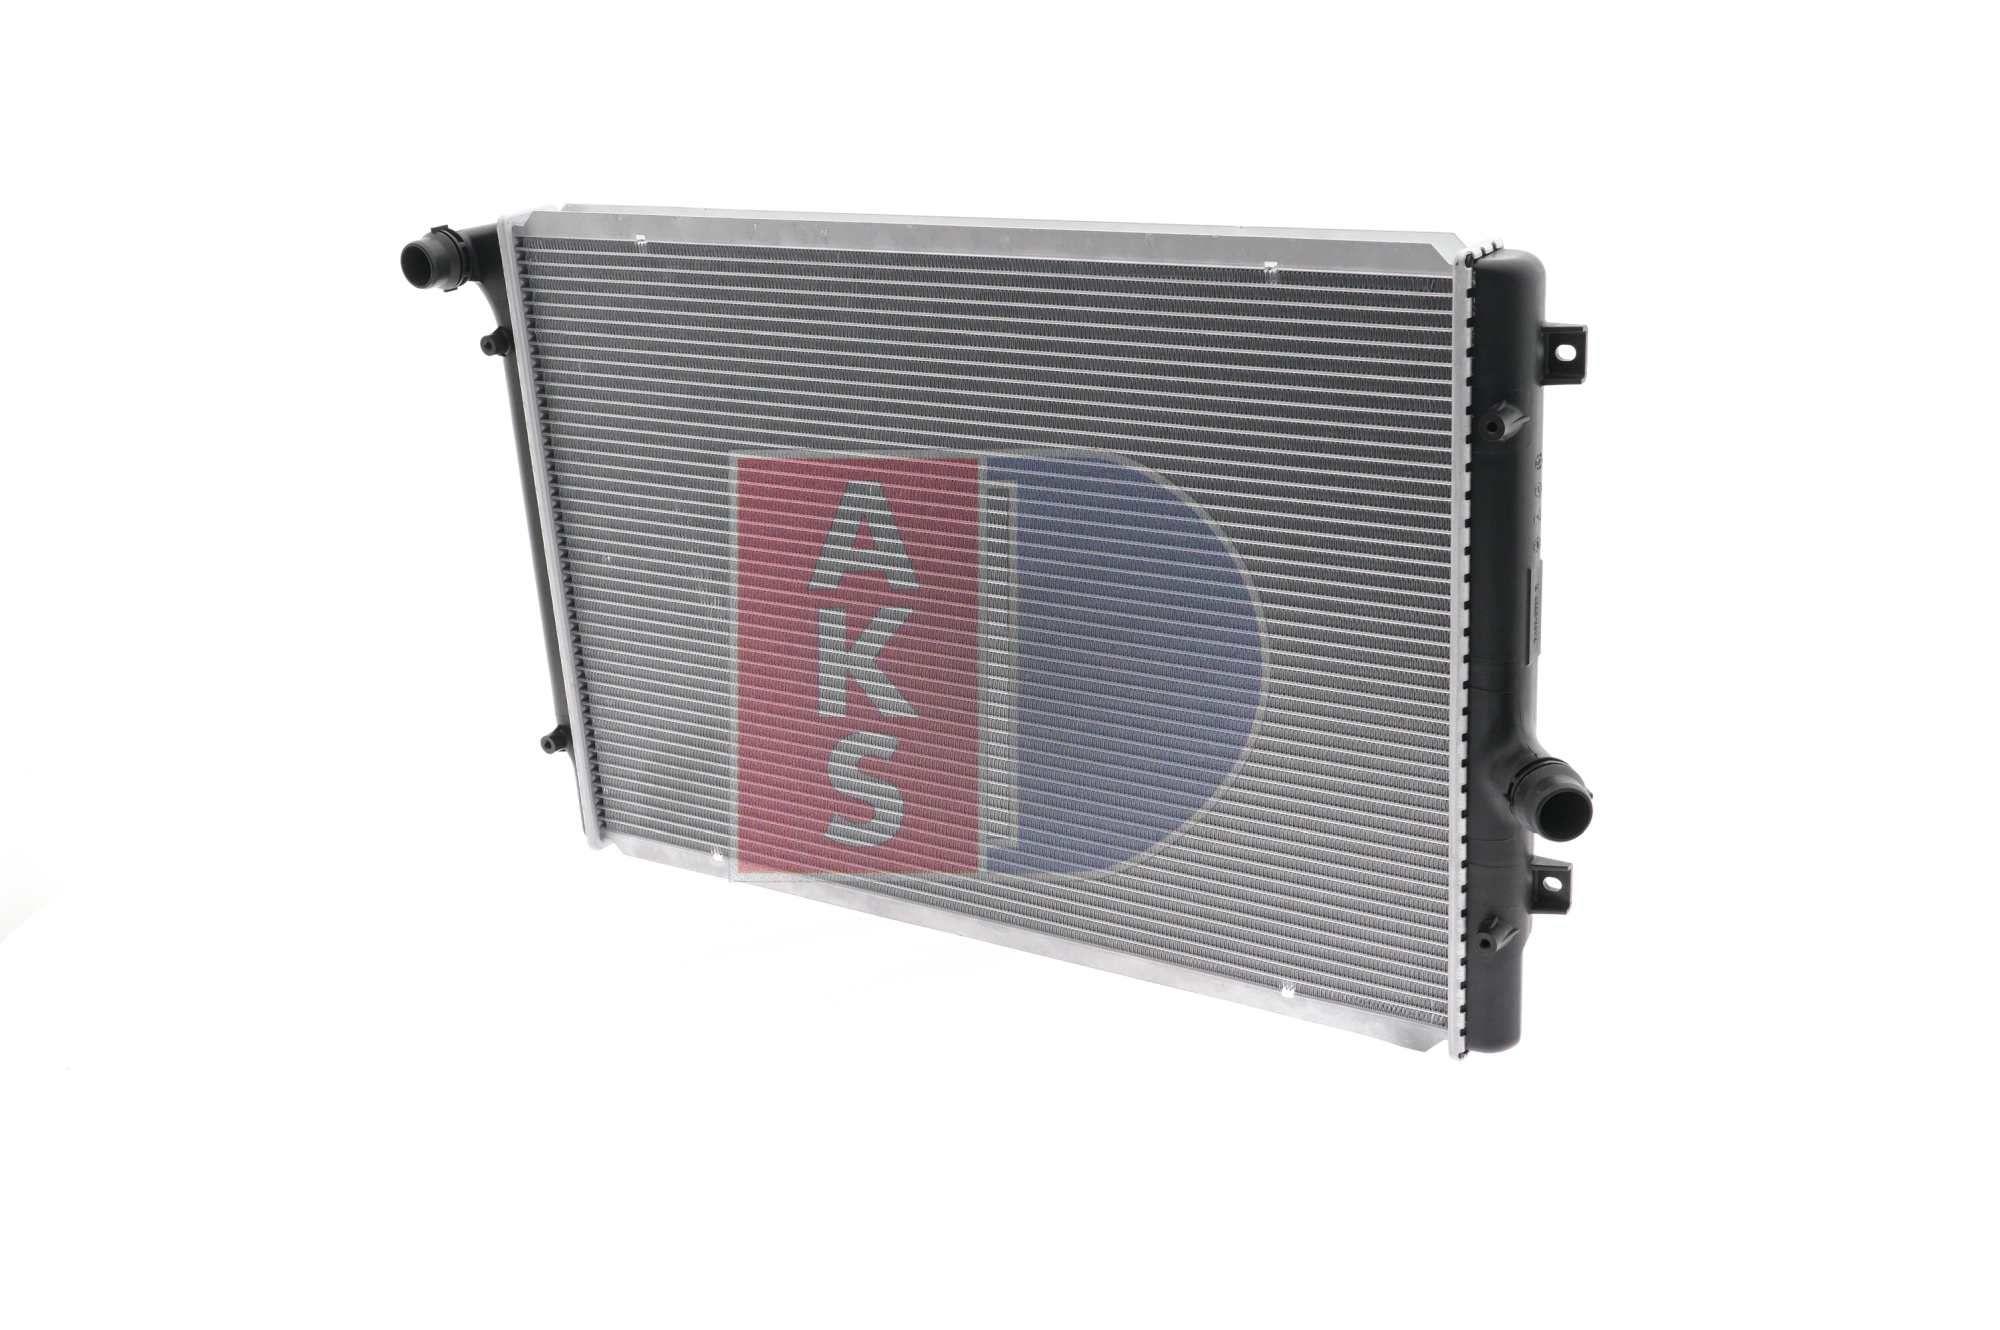 Motorkühler AKS DASIS 040026N Erfahrung